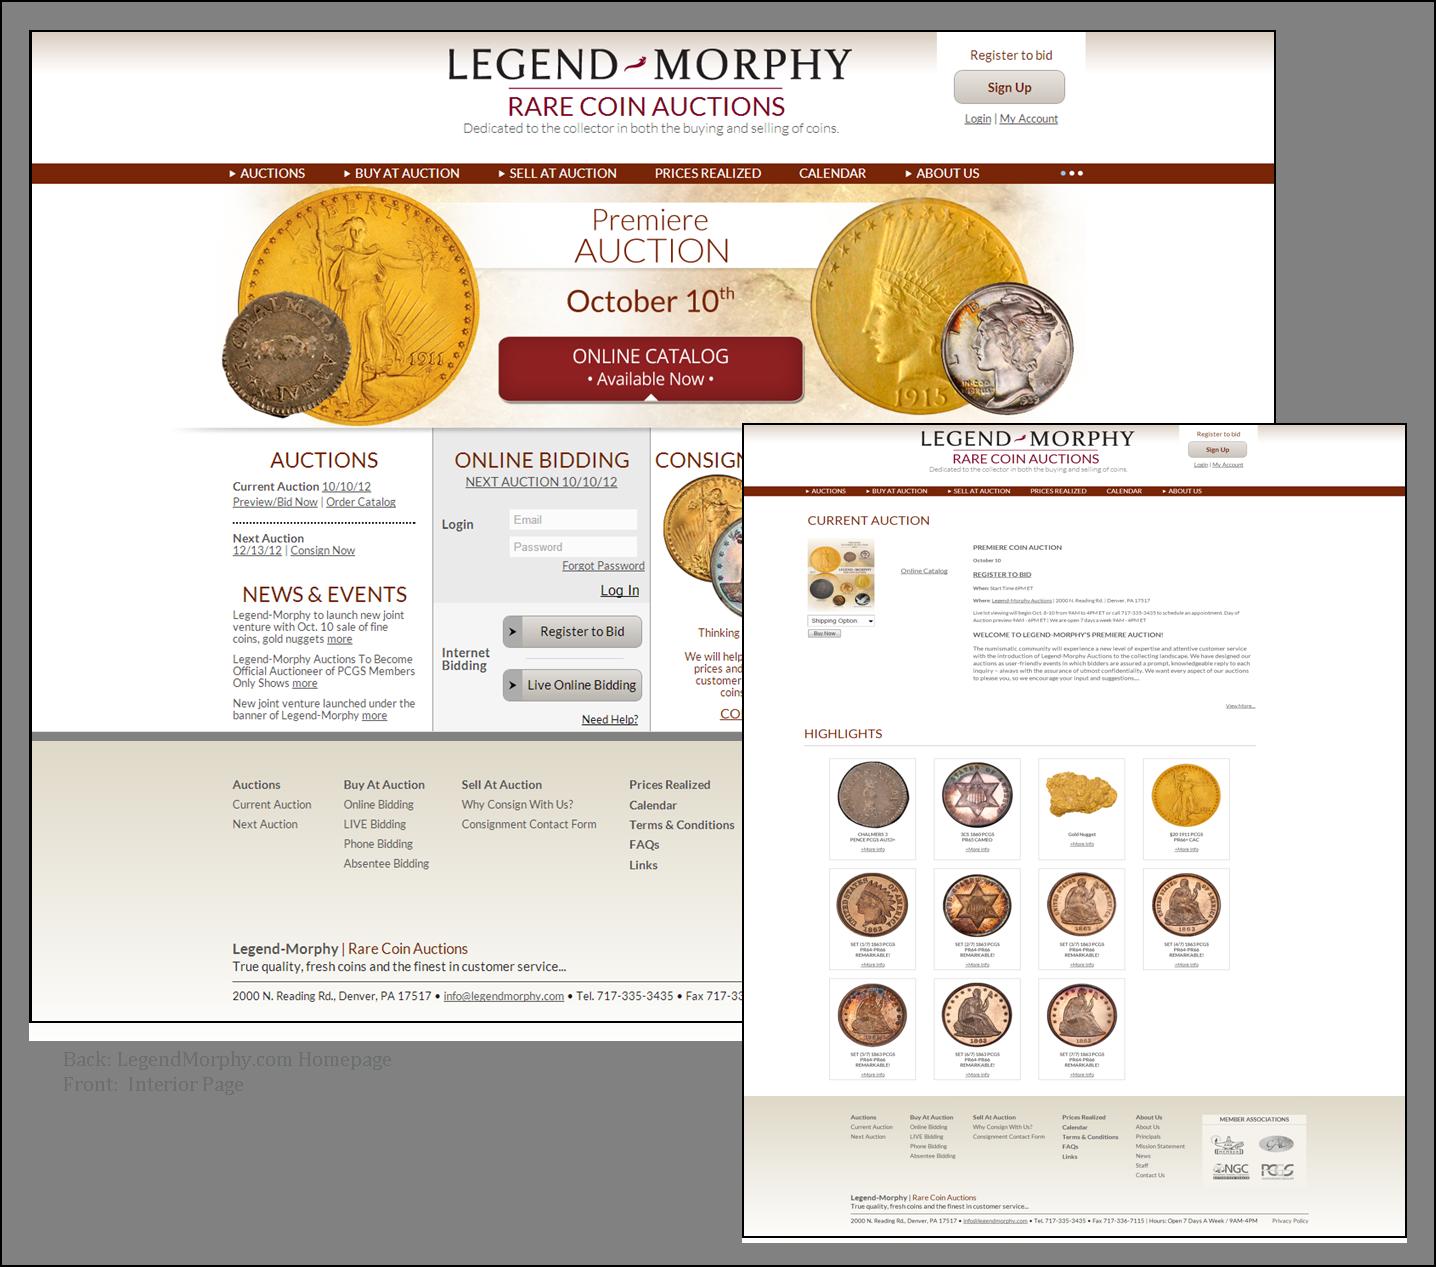 Legend-Morphy Rare Coins Auction Company Website